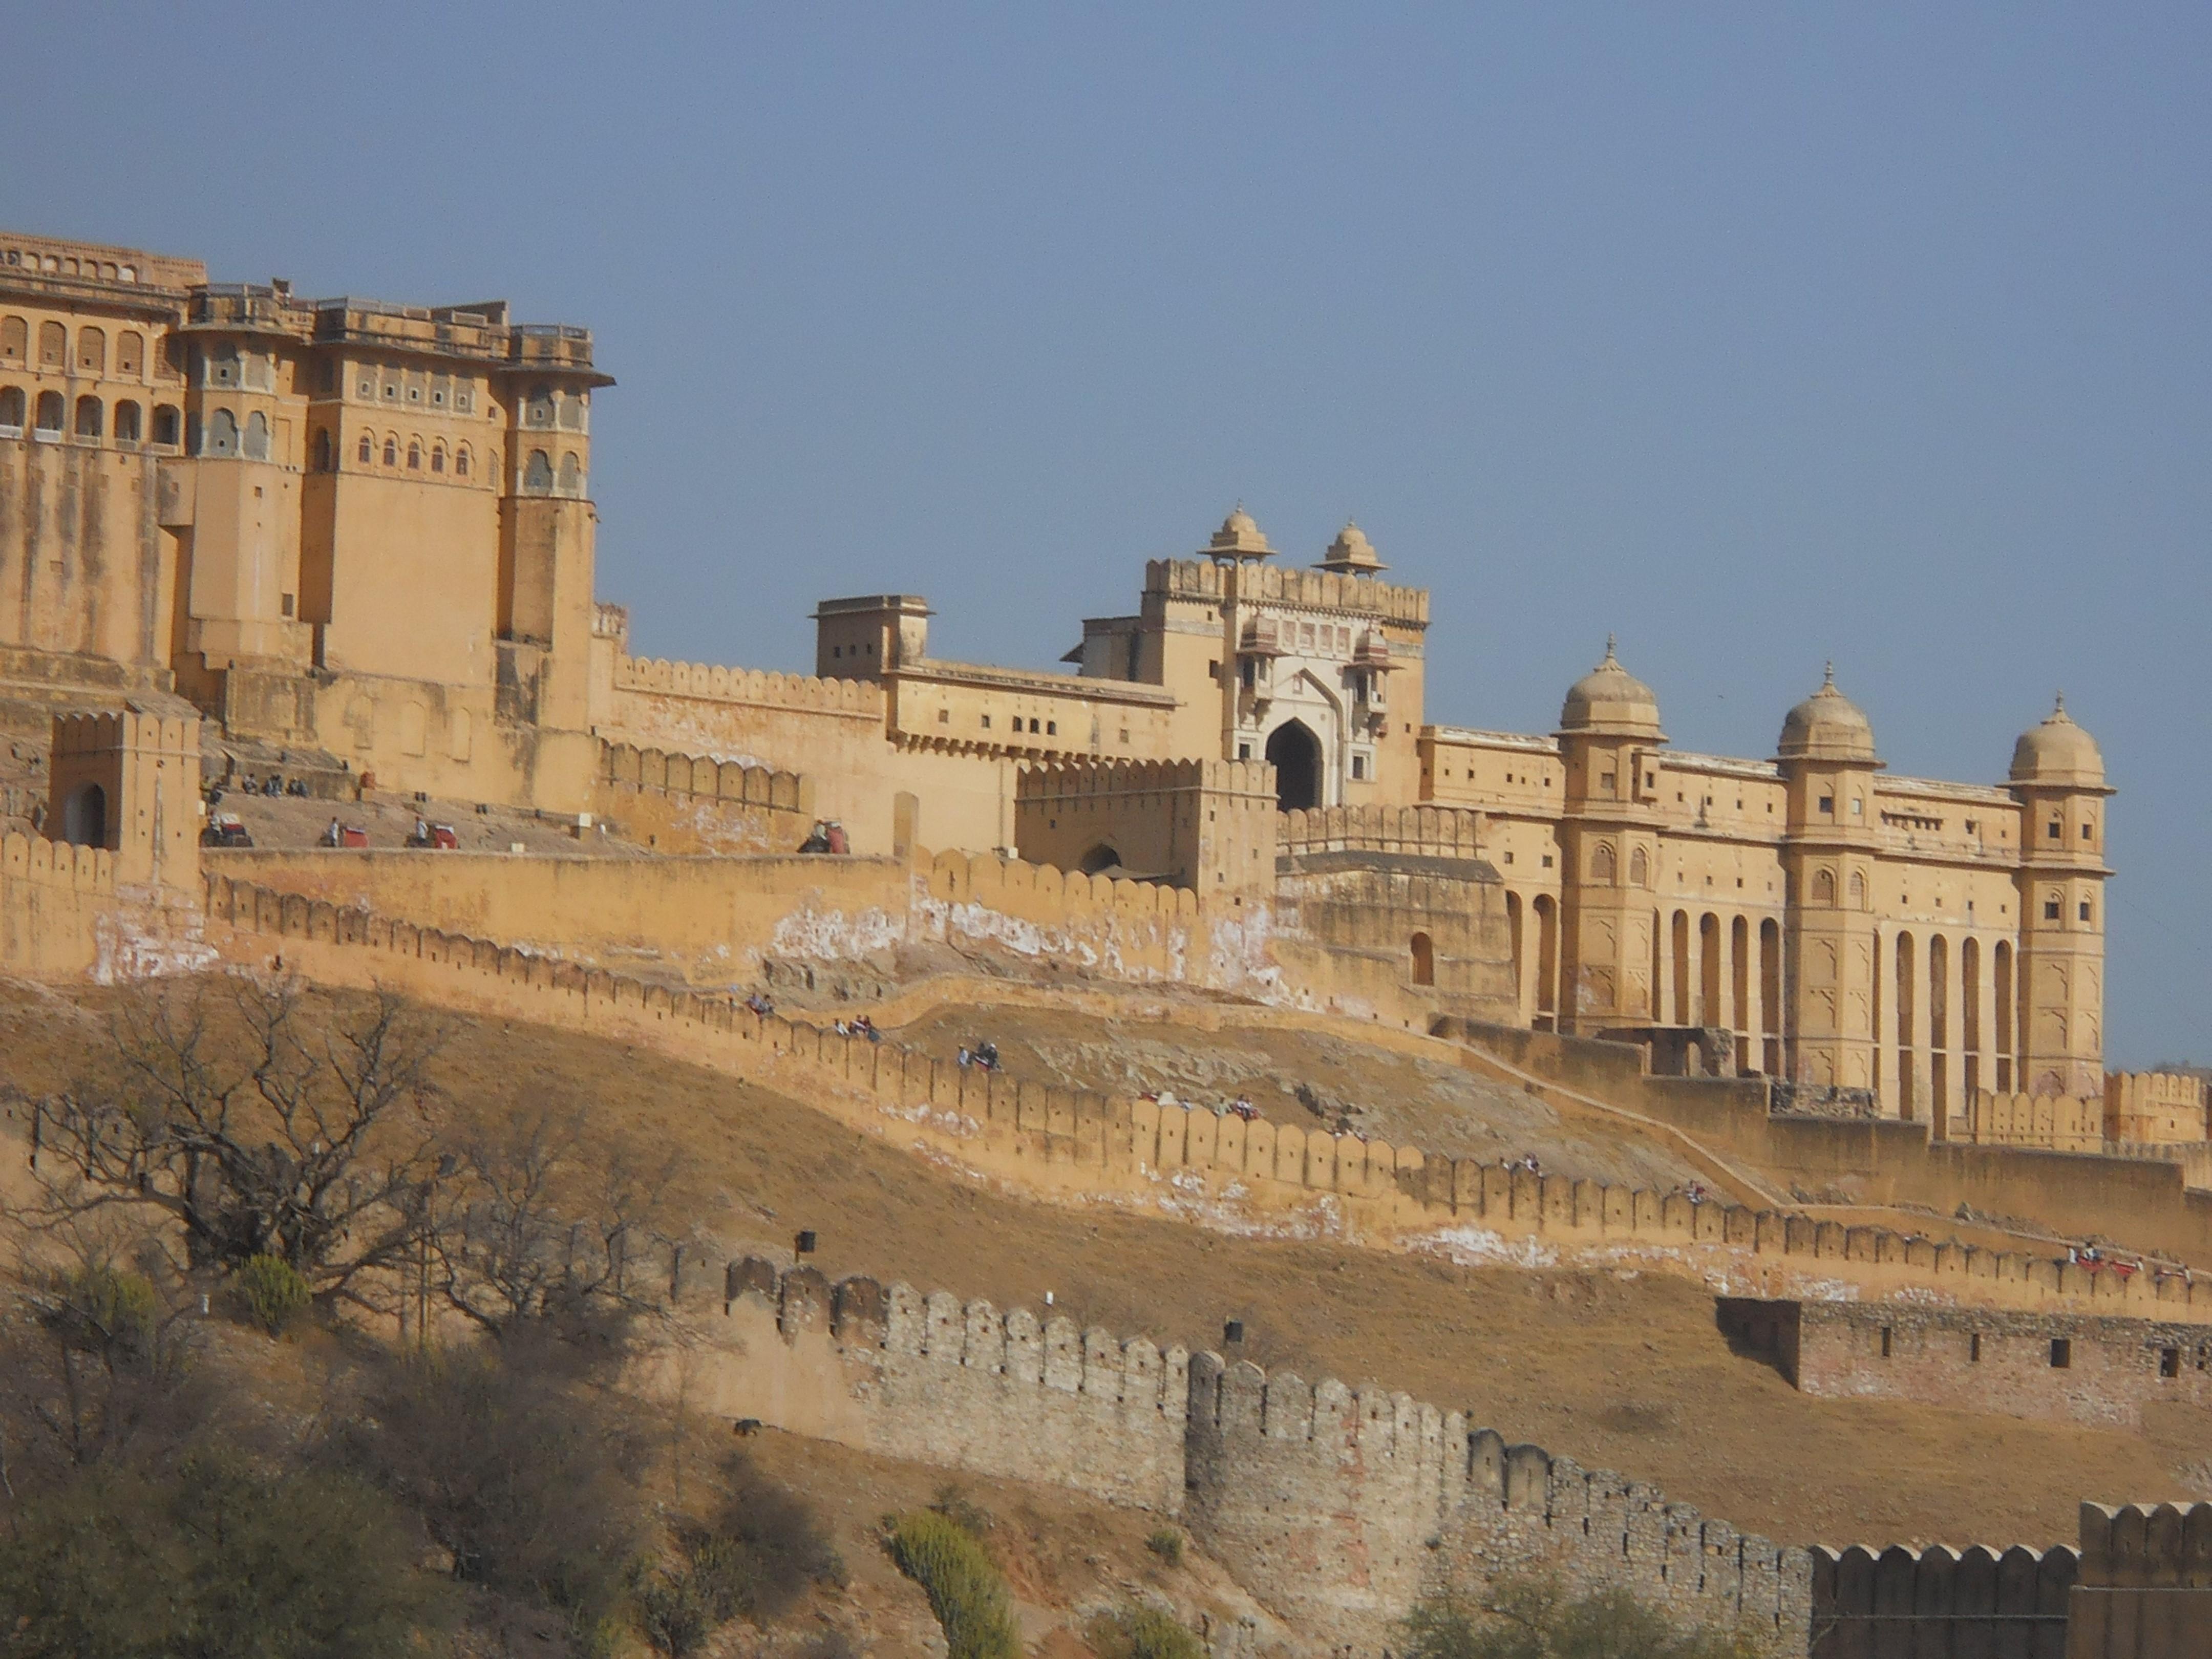 Pink City Jaipur by Train - ICS Travel Group